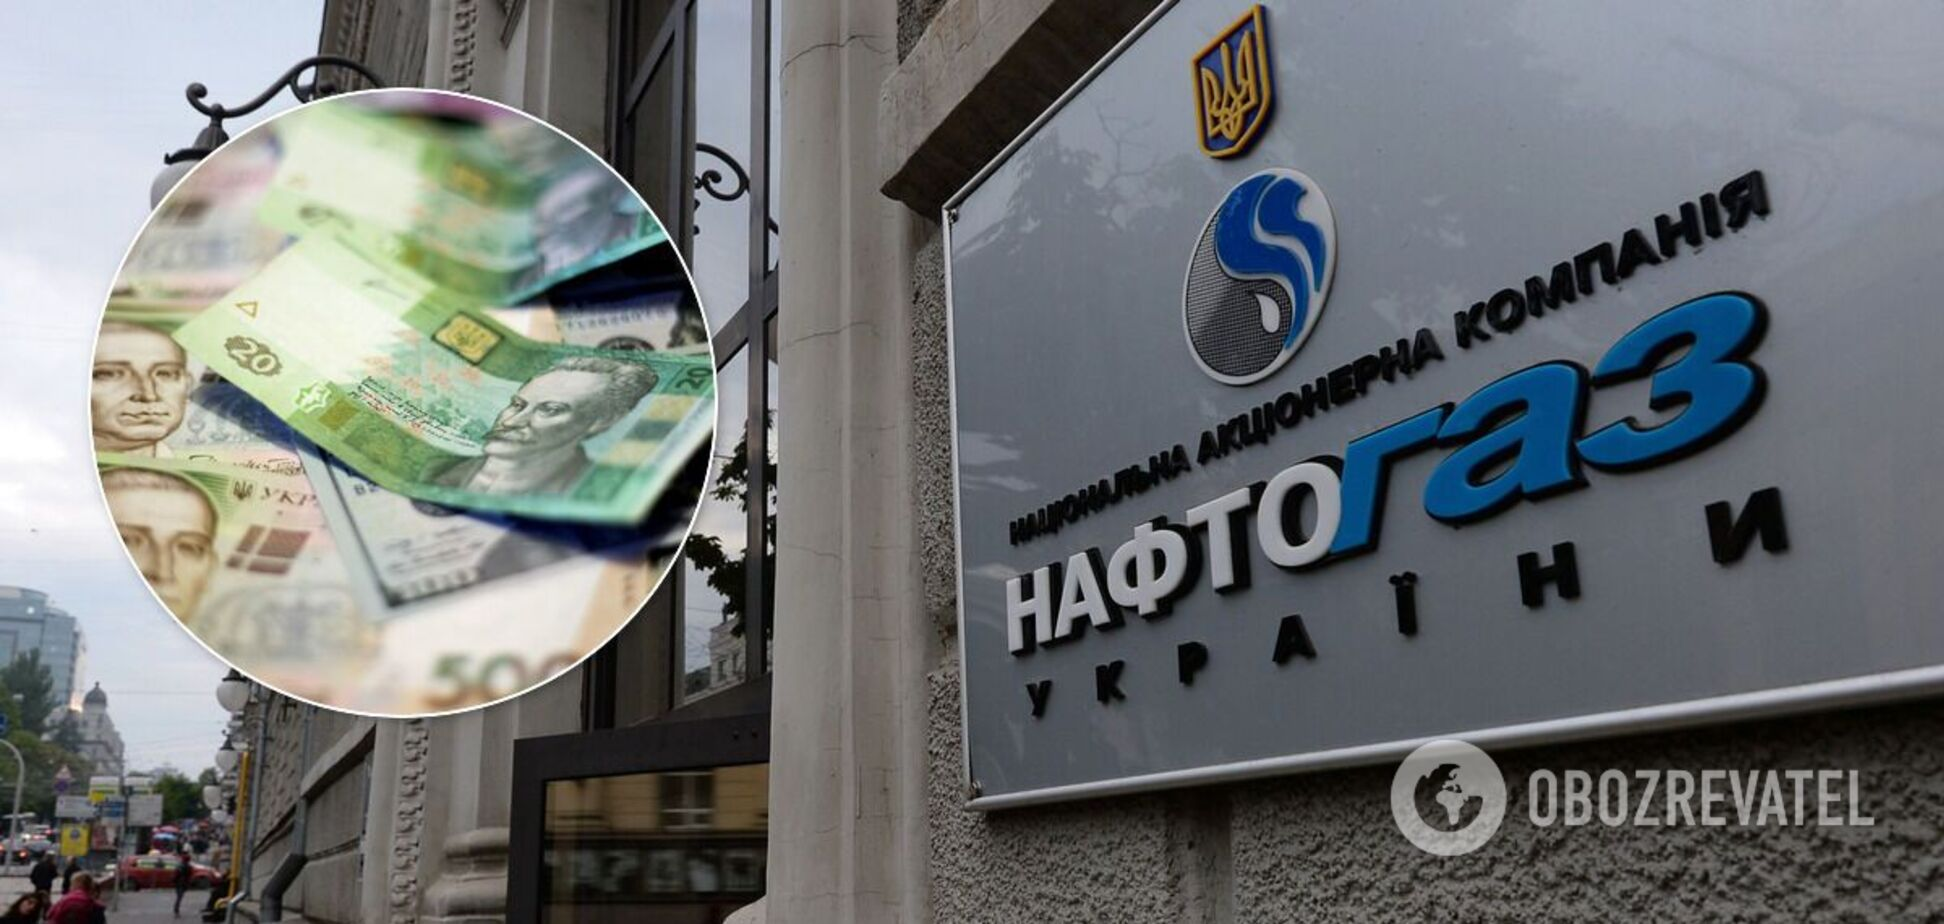 Борги 'Укрнафти' передадуть 'Нафтогазу': 'Слуги народу' ухвалили остаточне рішення